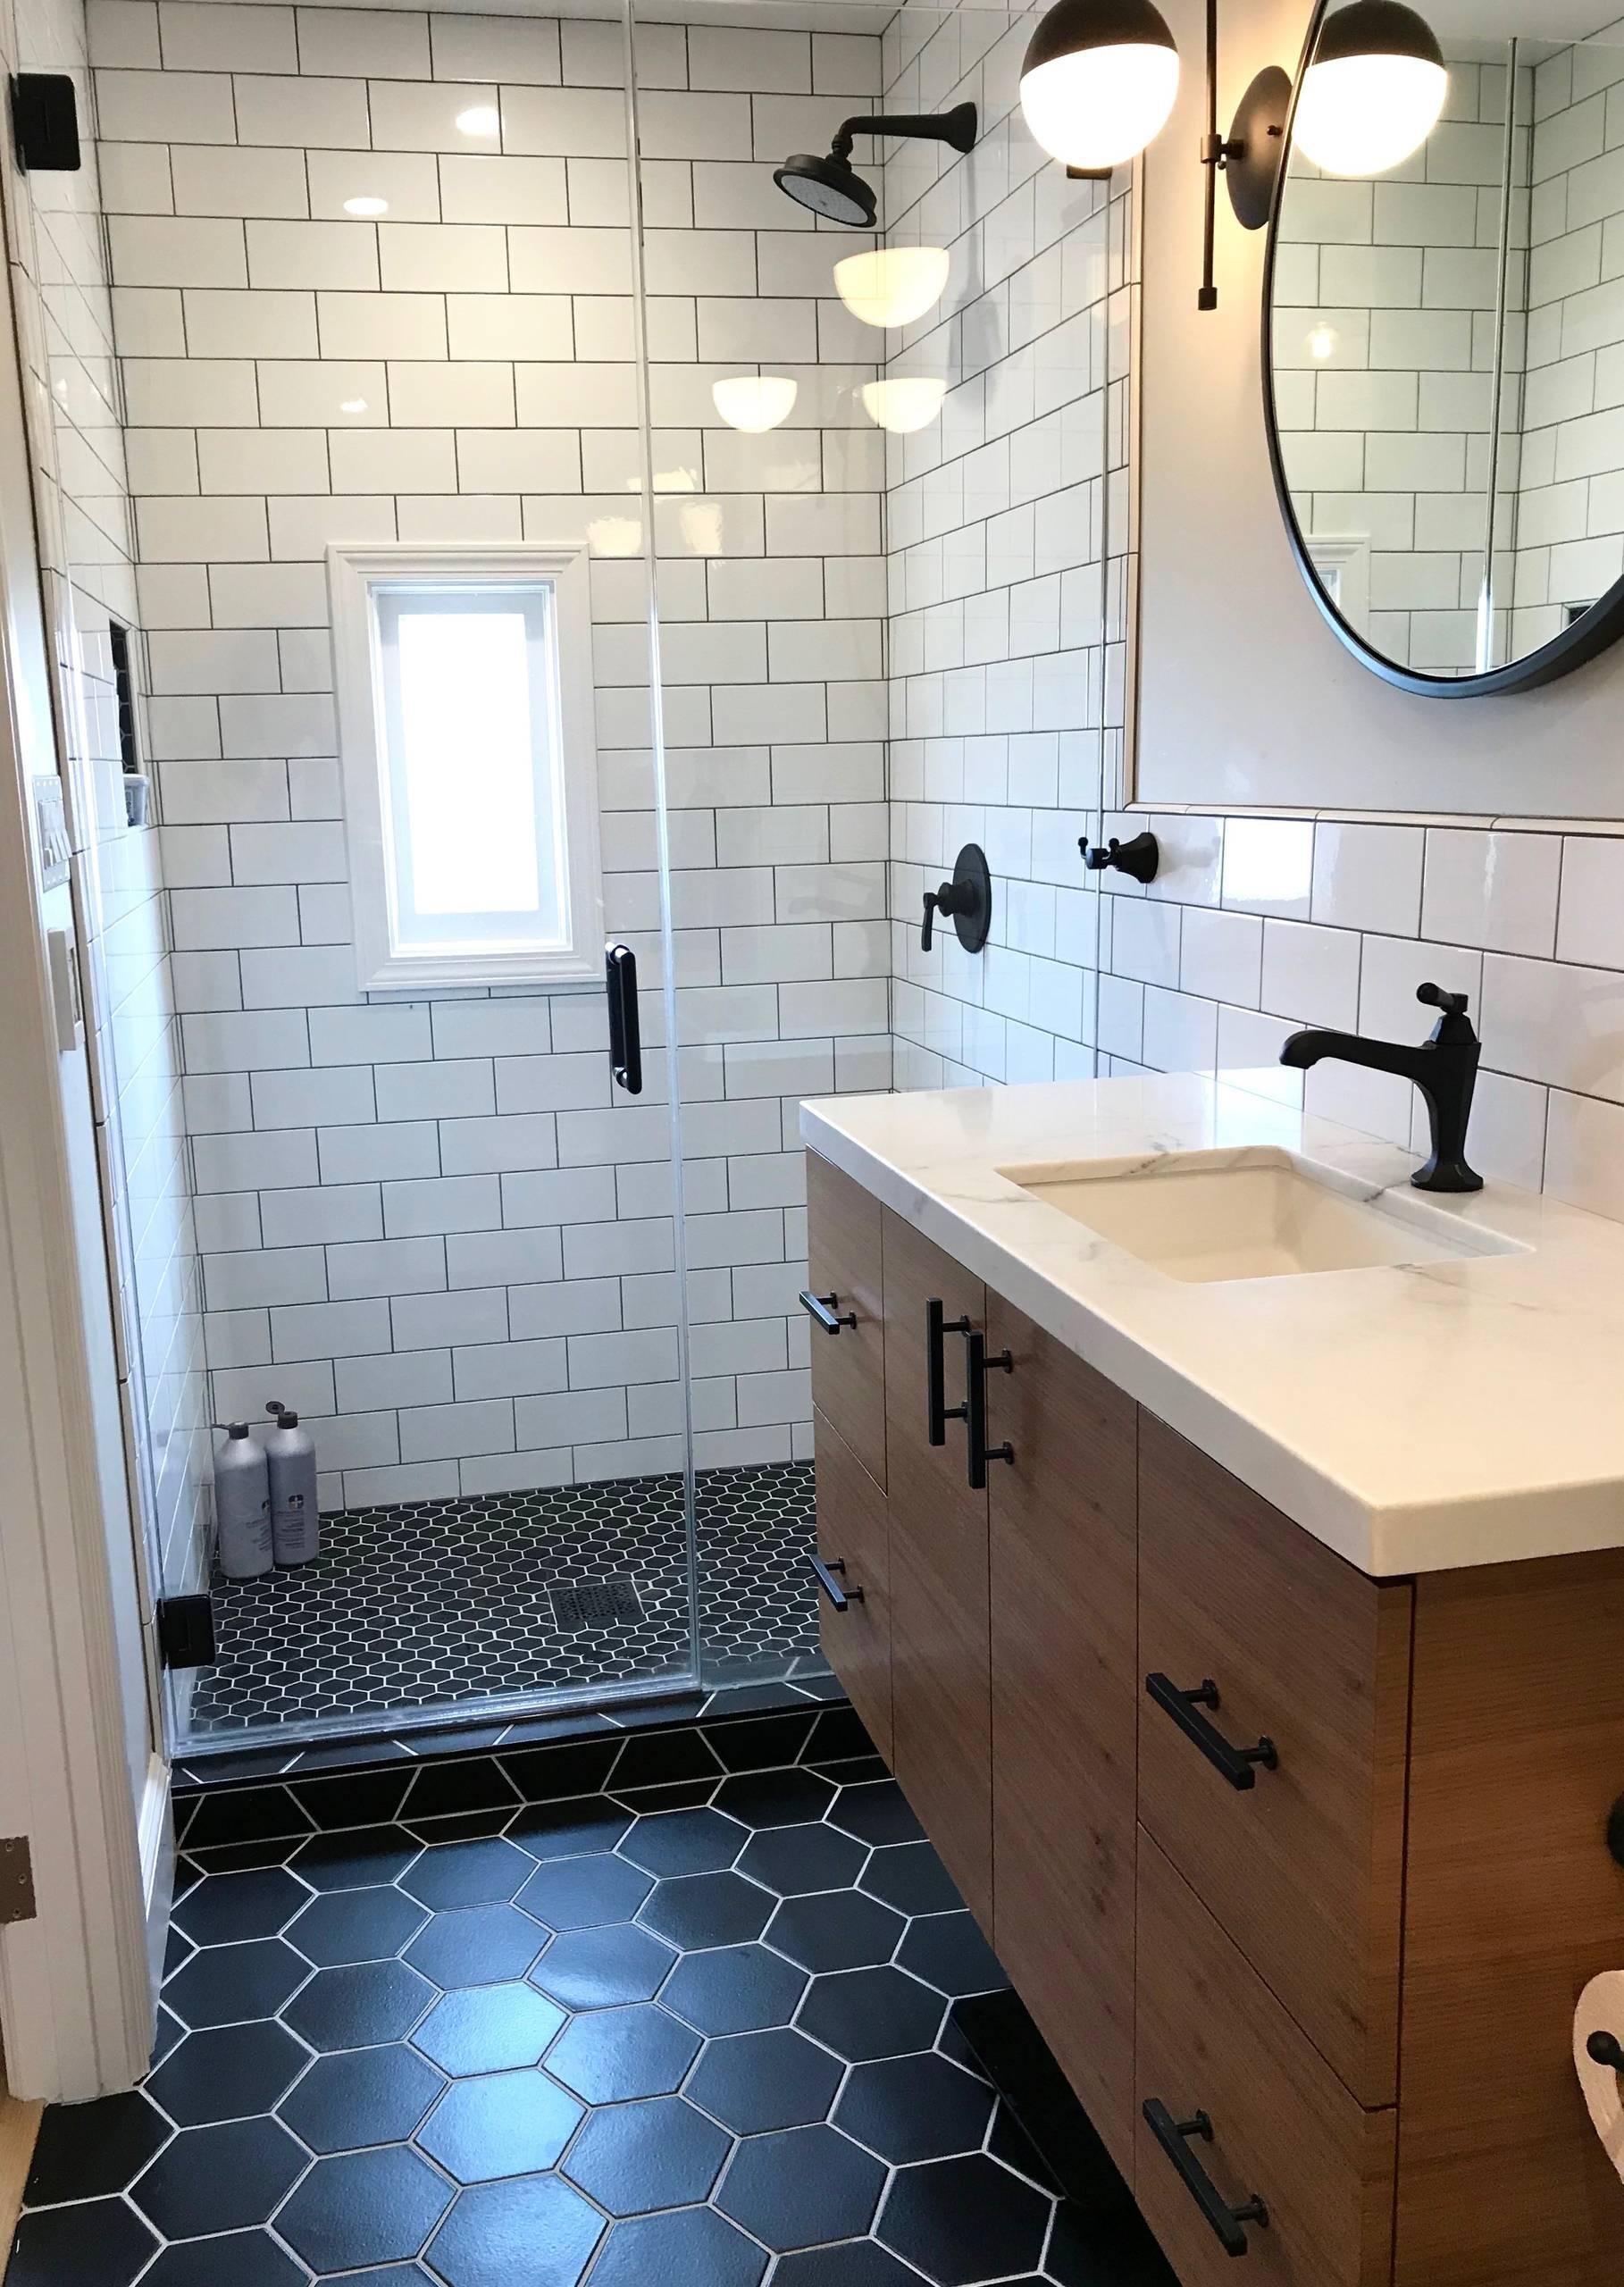 7 Beautiful Mid-Century Modern Bathroom Pictures & Ideas